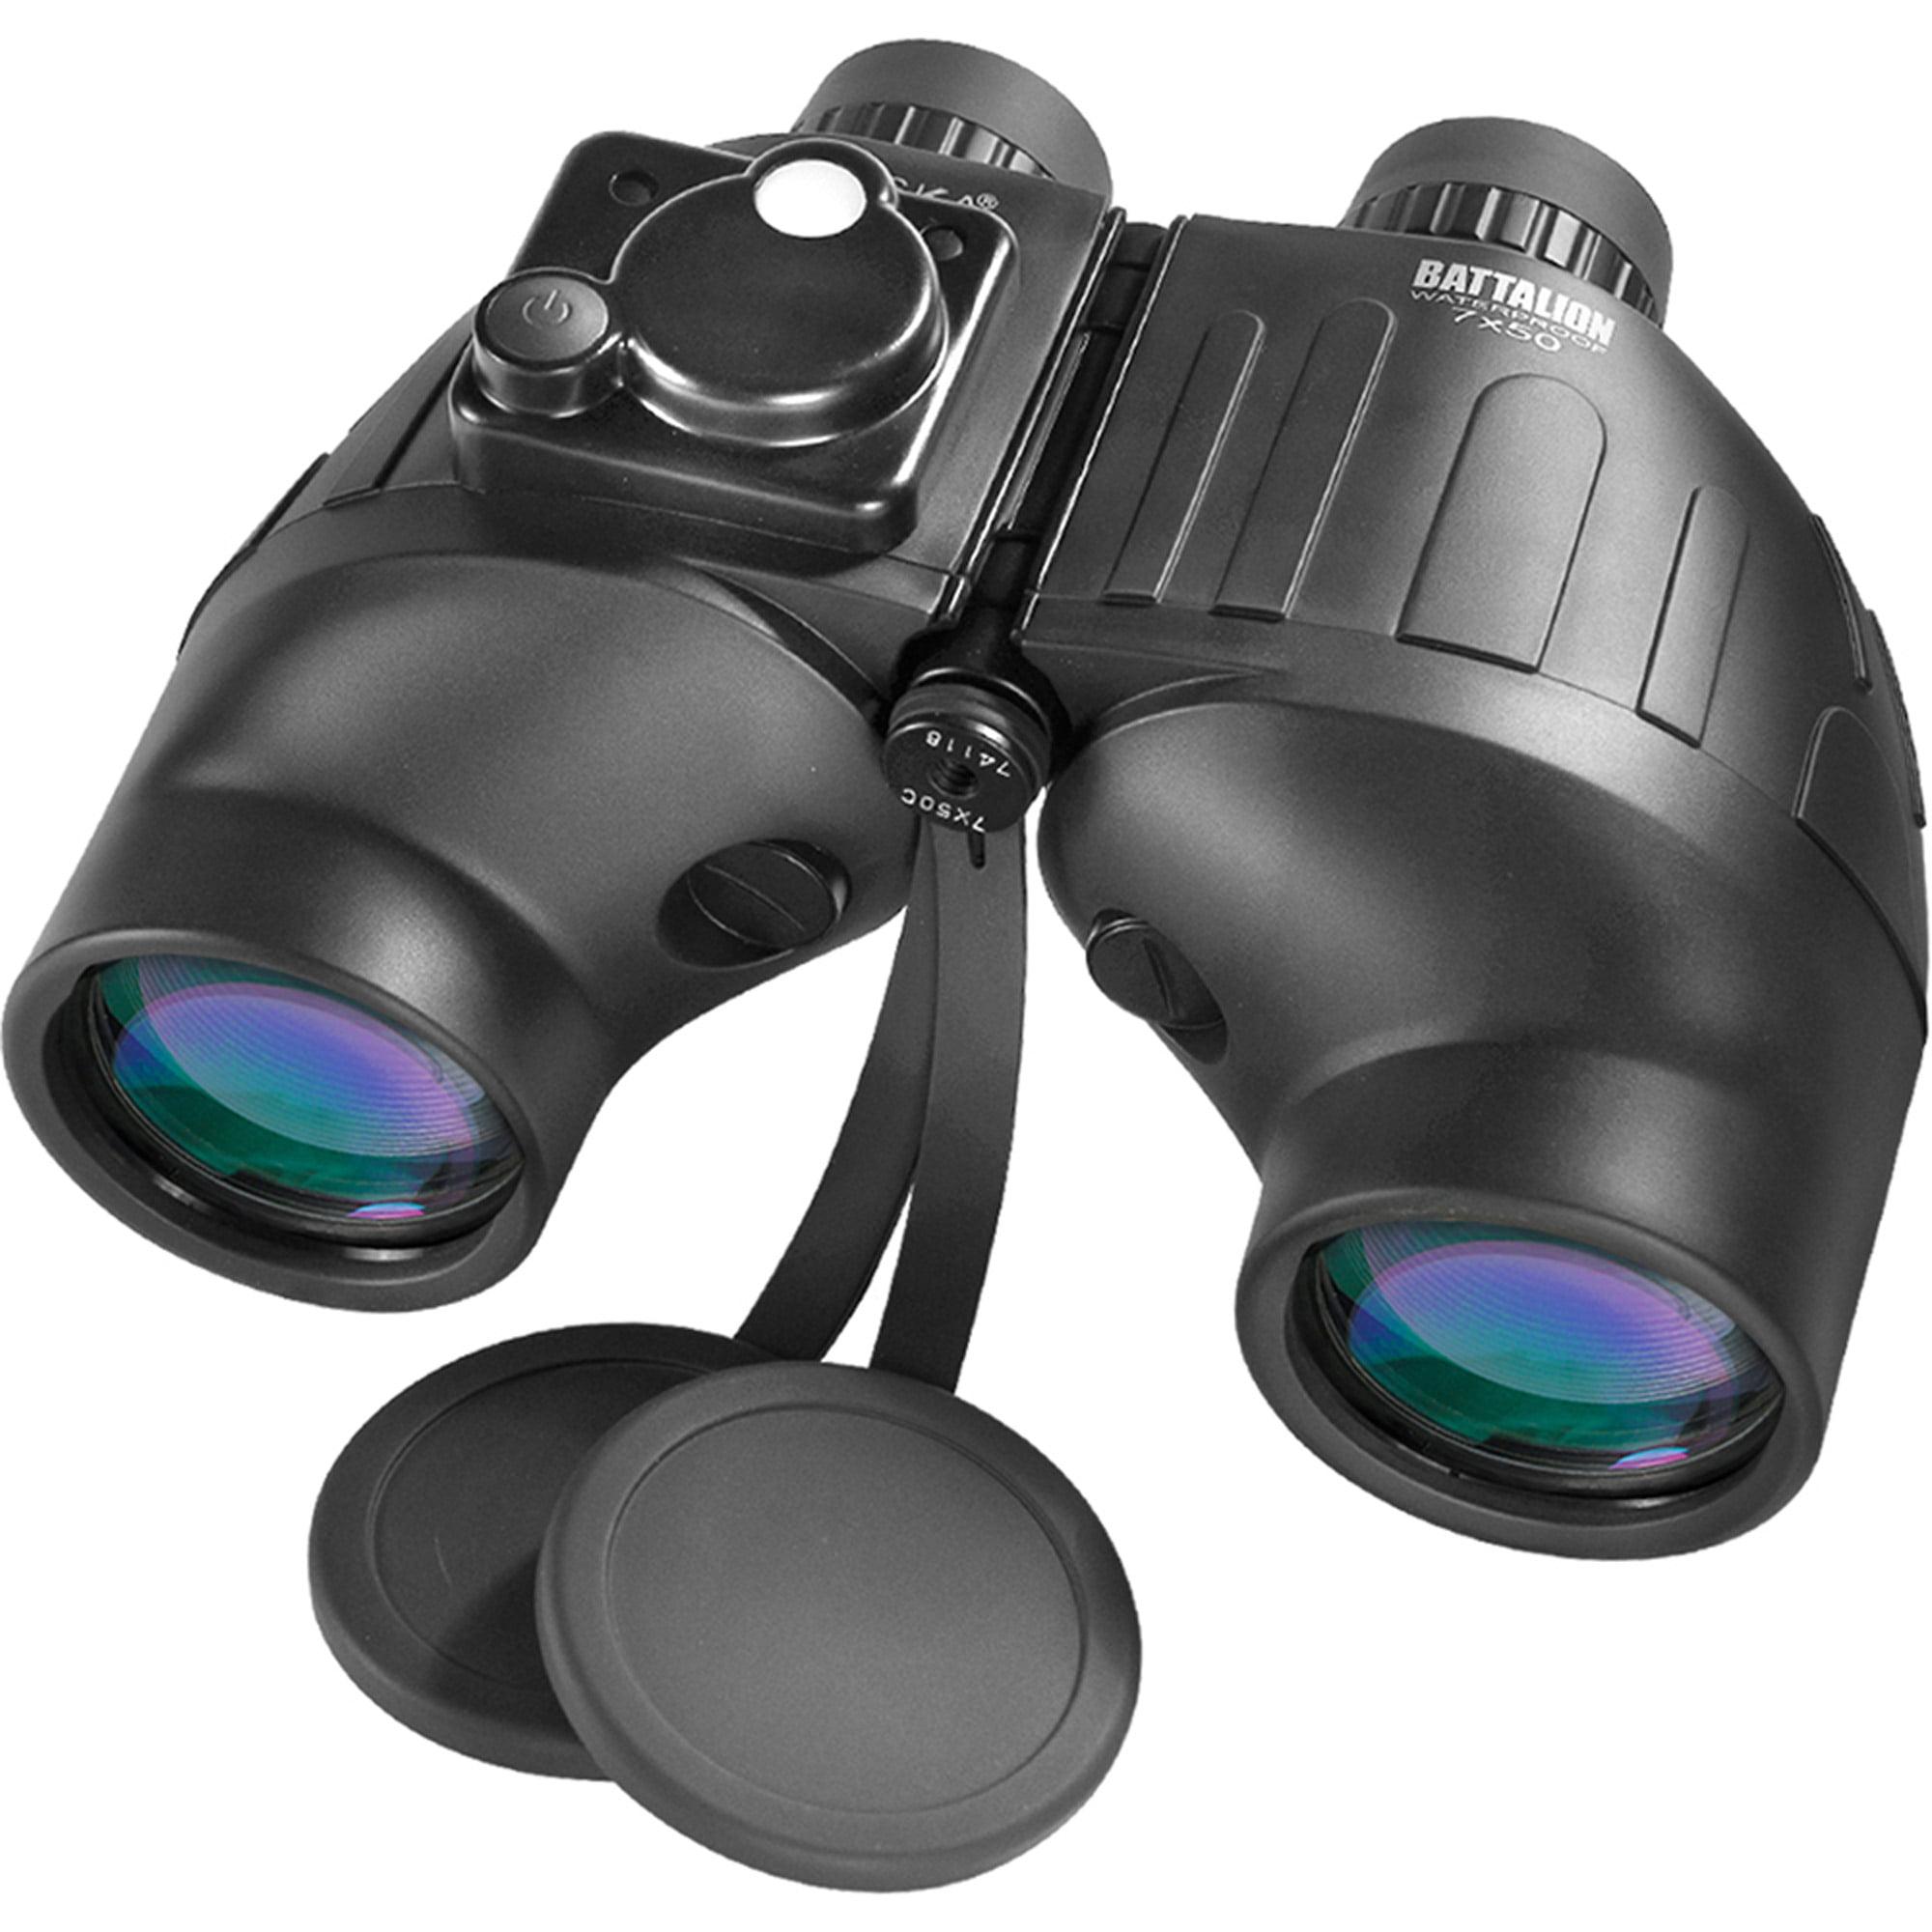 Barska Optics Battalion Binoculars, 7x50mm, Rangefinder/Compass